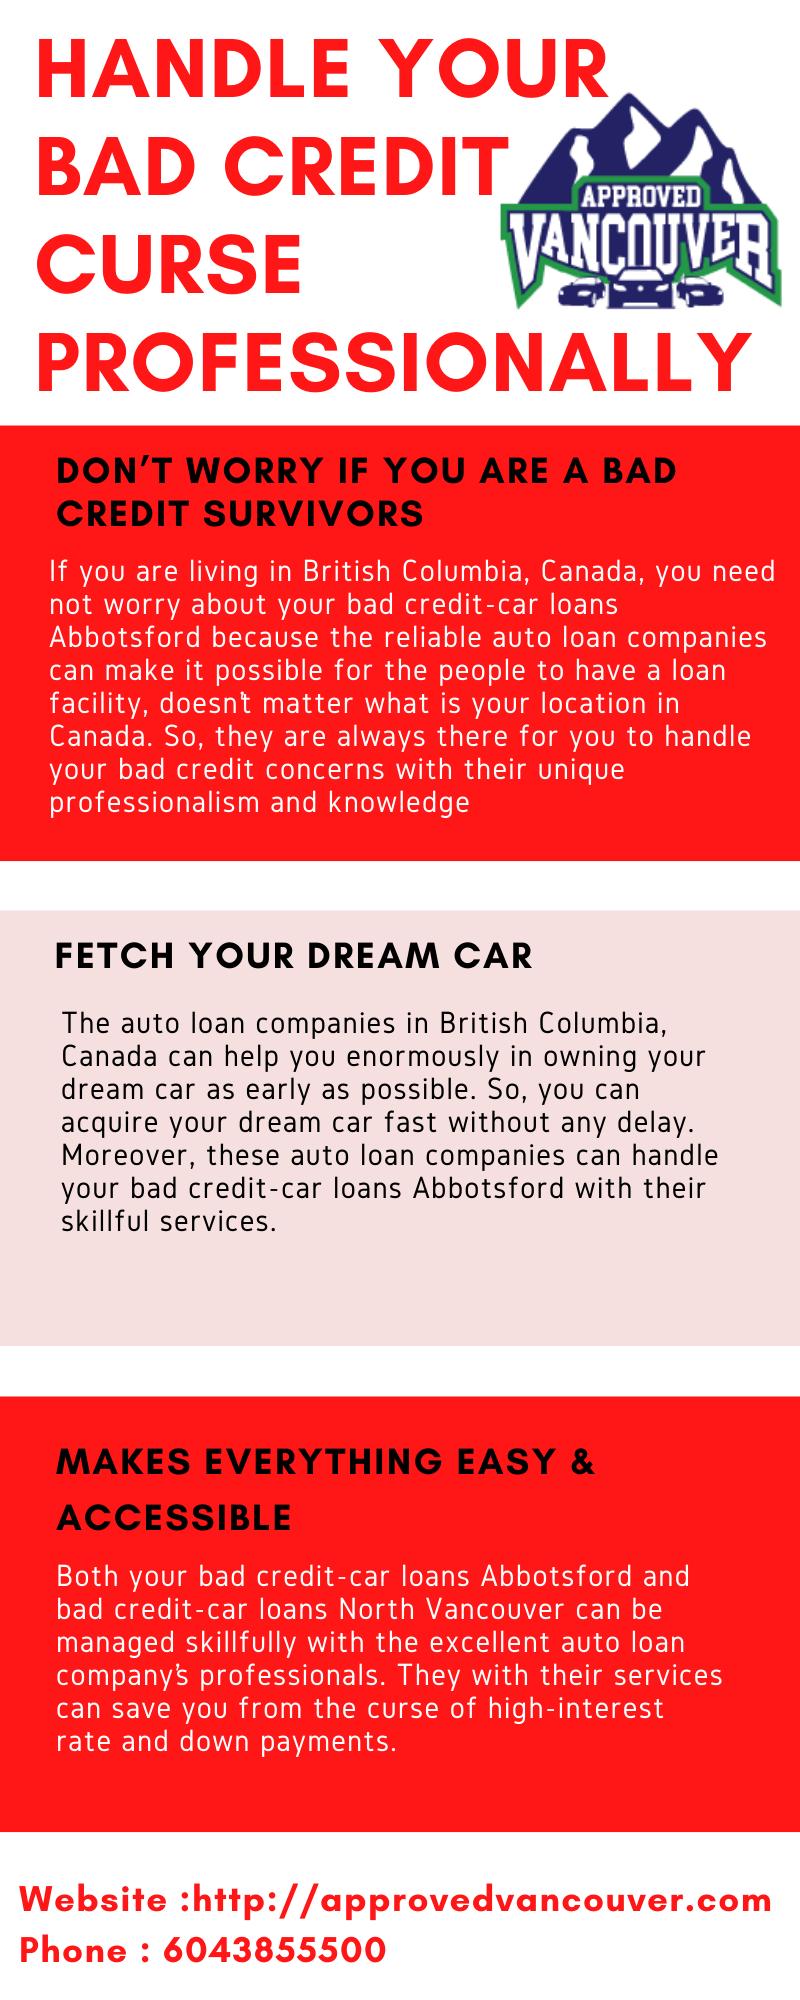 Bad Credit Car Loans Vancouver In 2020 Bad Credit Car Loan Credit Cars Car Loans